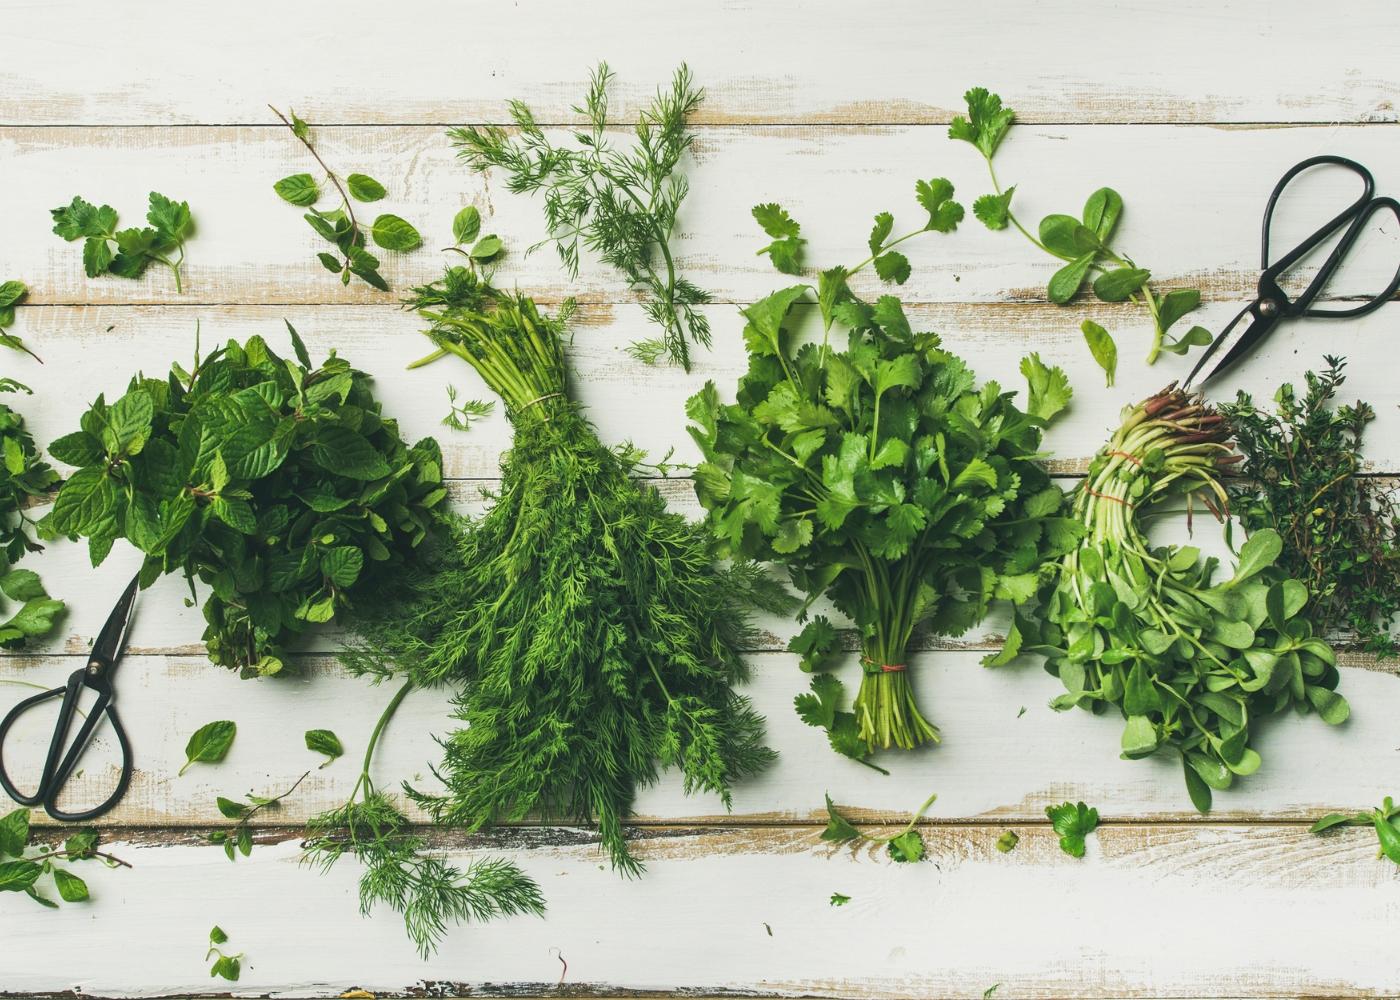 ervas aromáticas cortadas